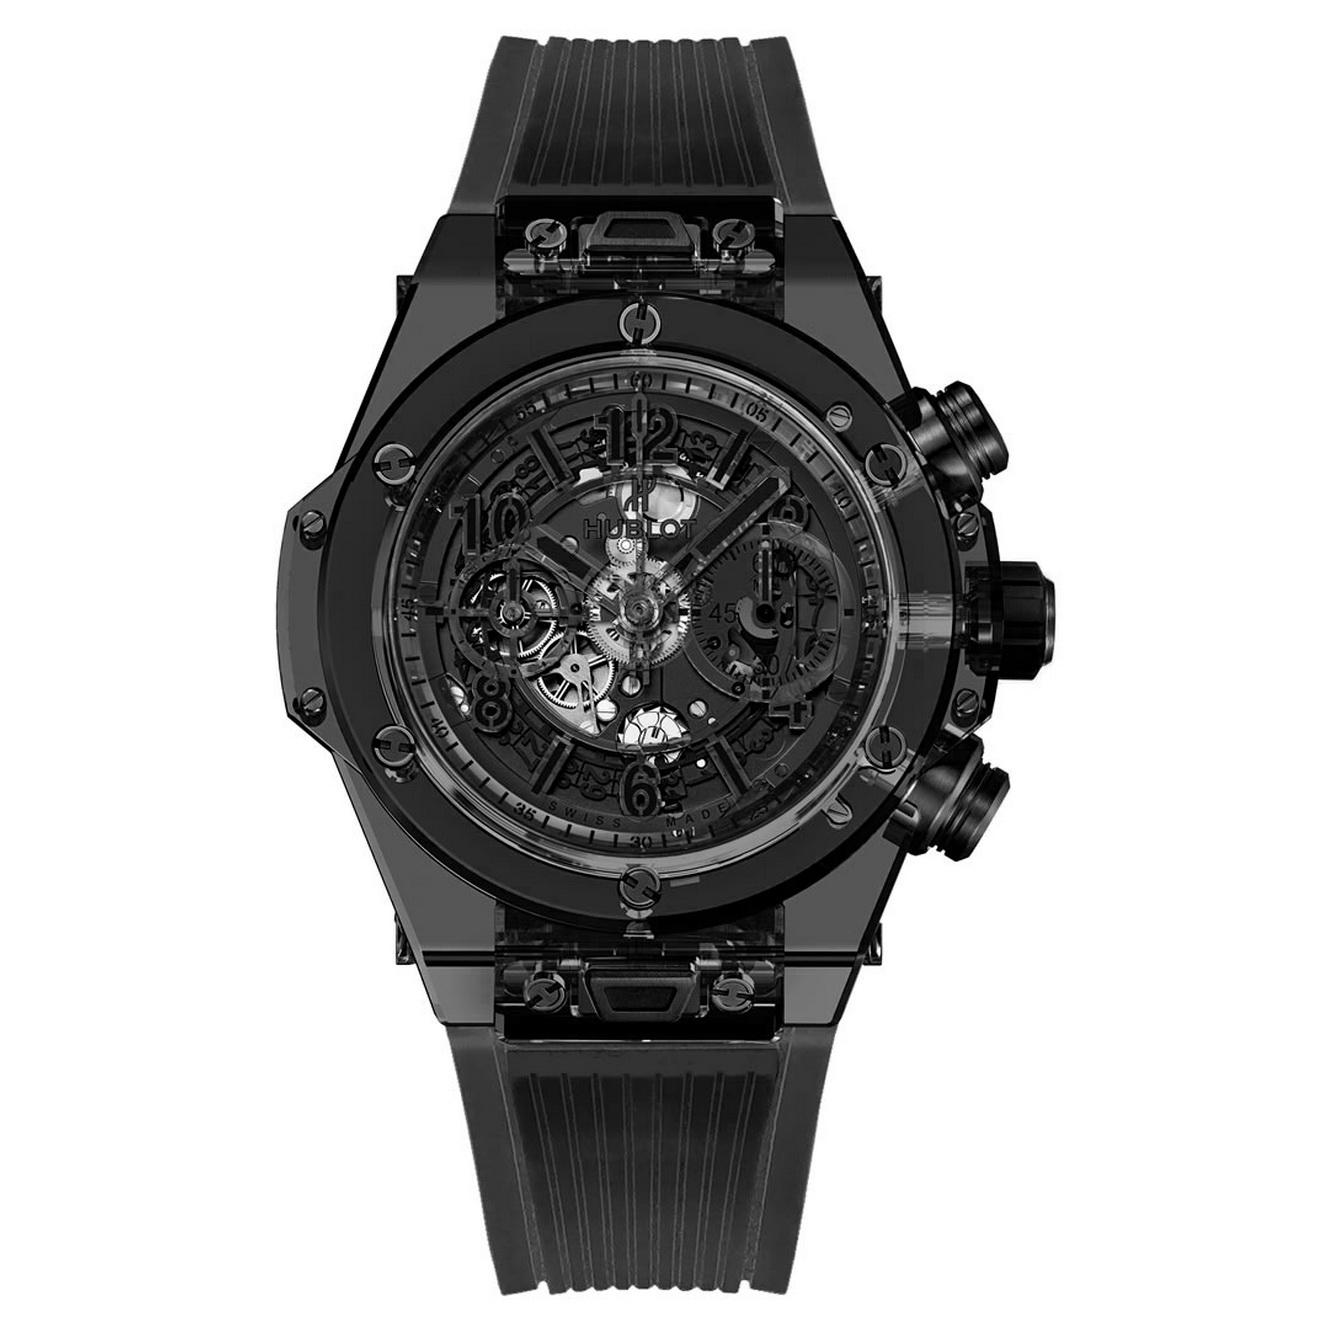 Big Bang Unico Sapphire All Black 411.JB.4901.RT